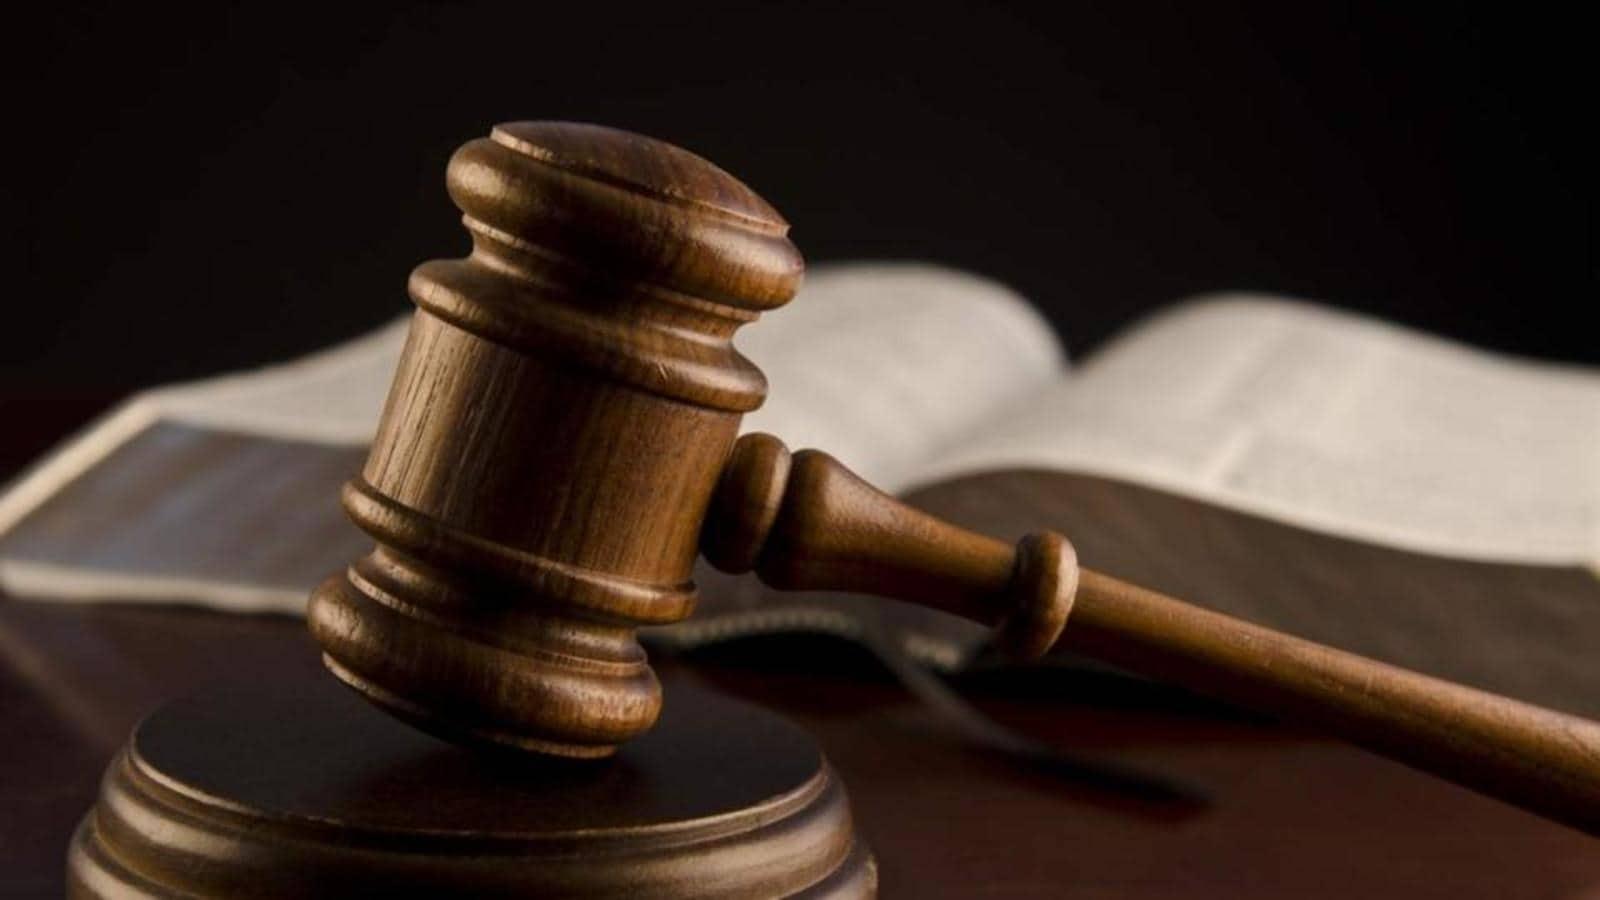 High Court dismisses PIL seeking political asylum for three Afghan nationals